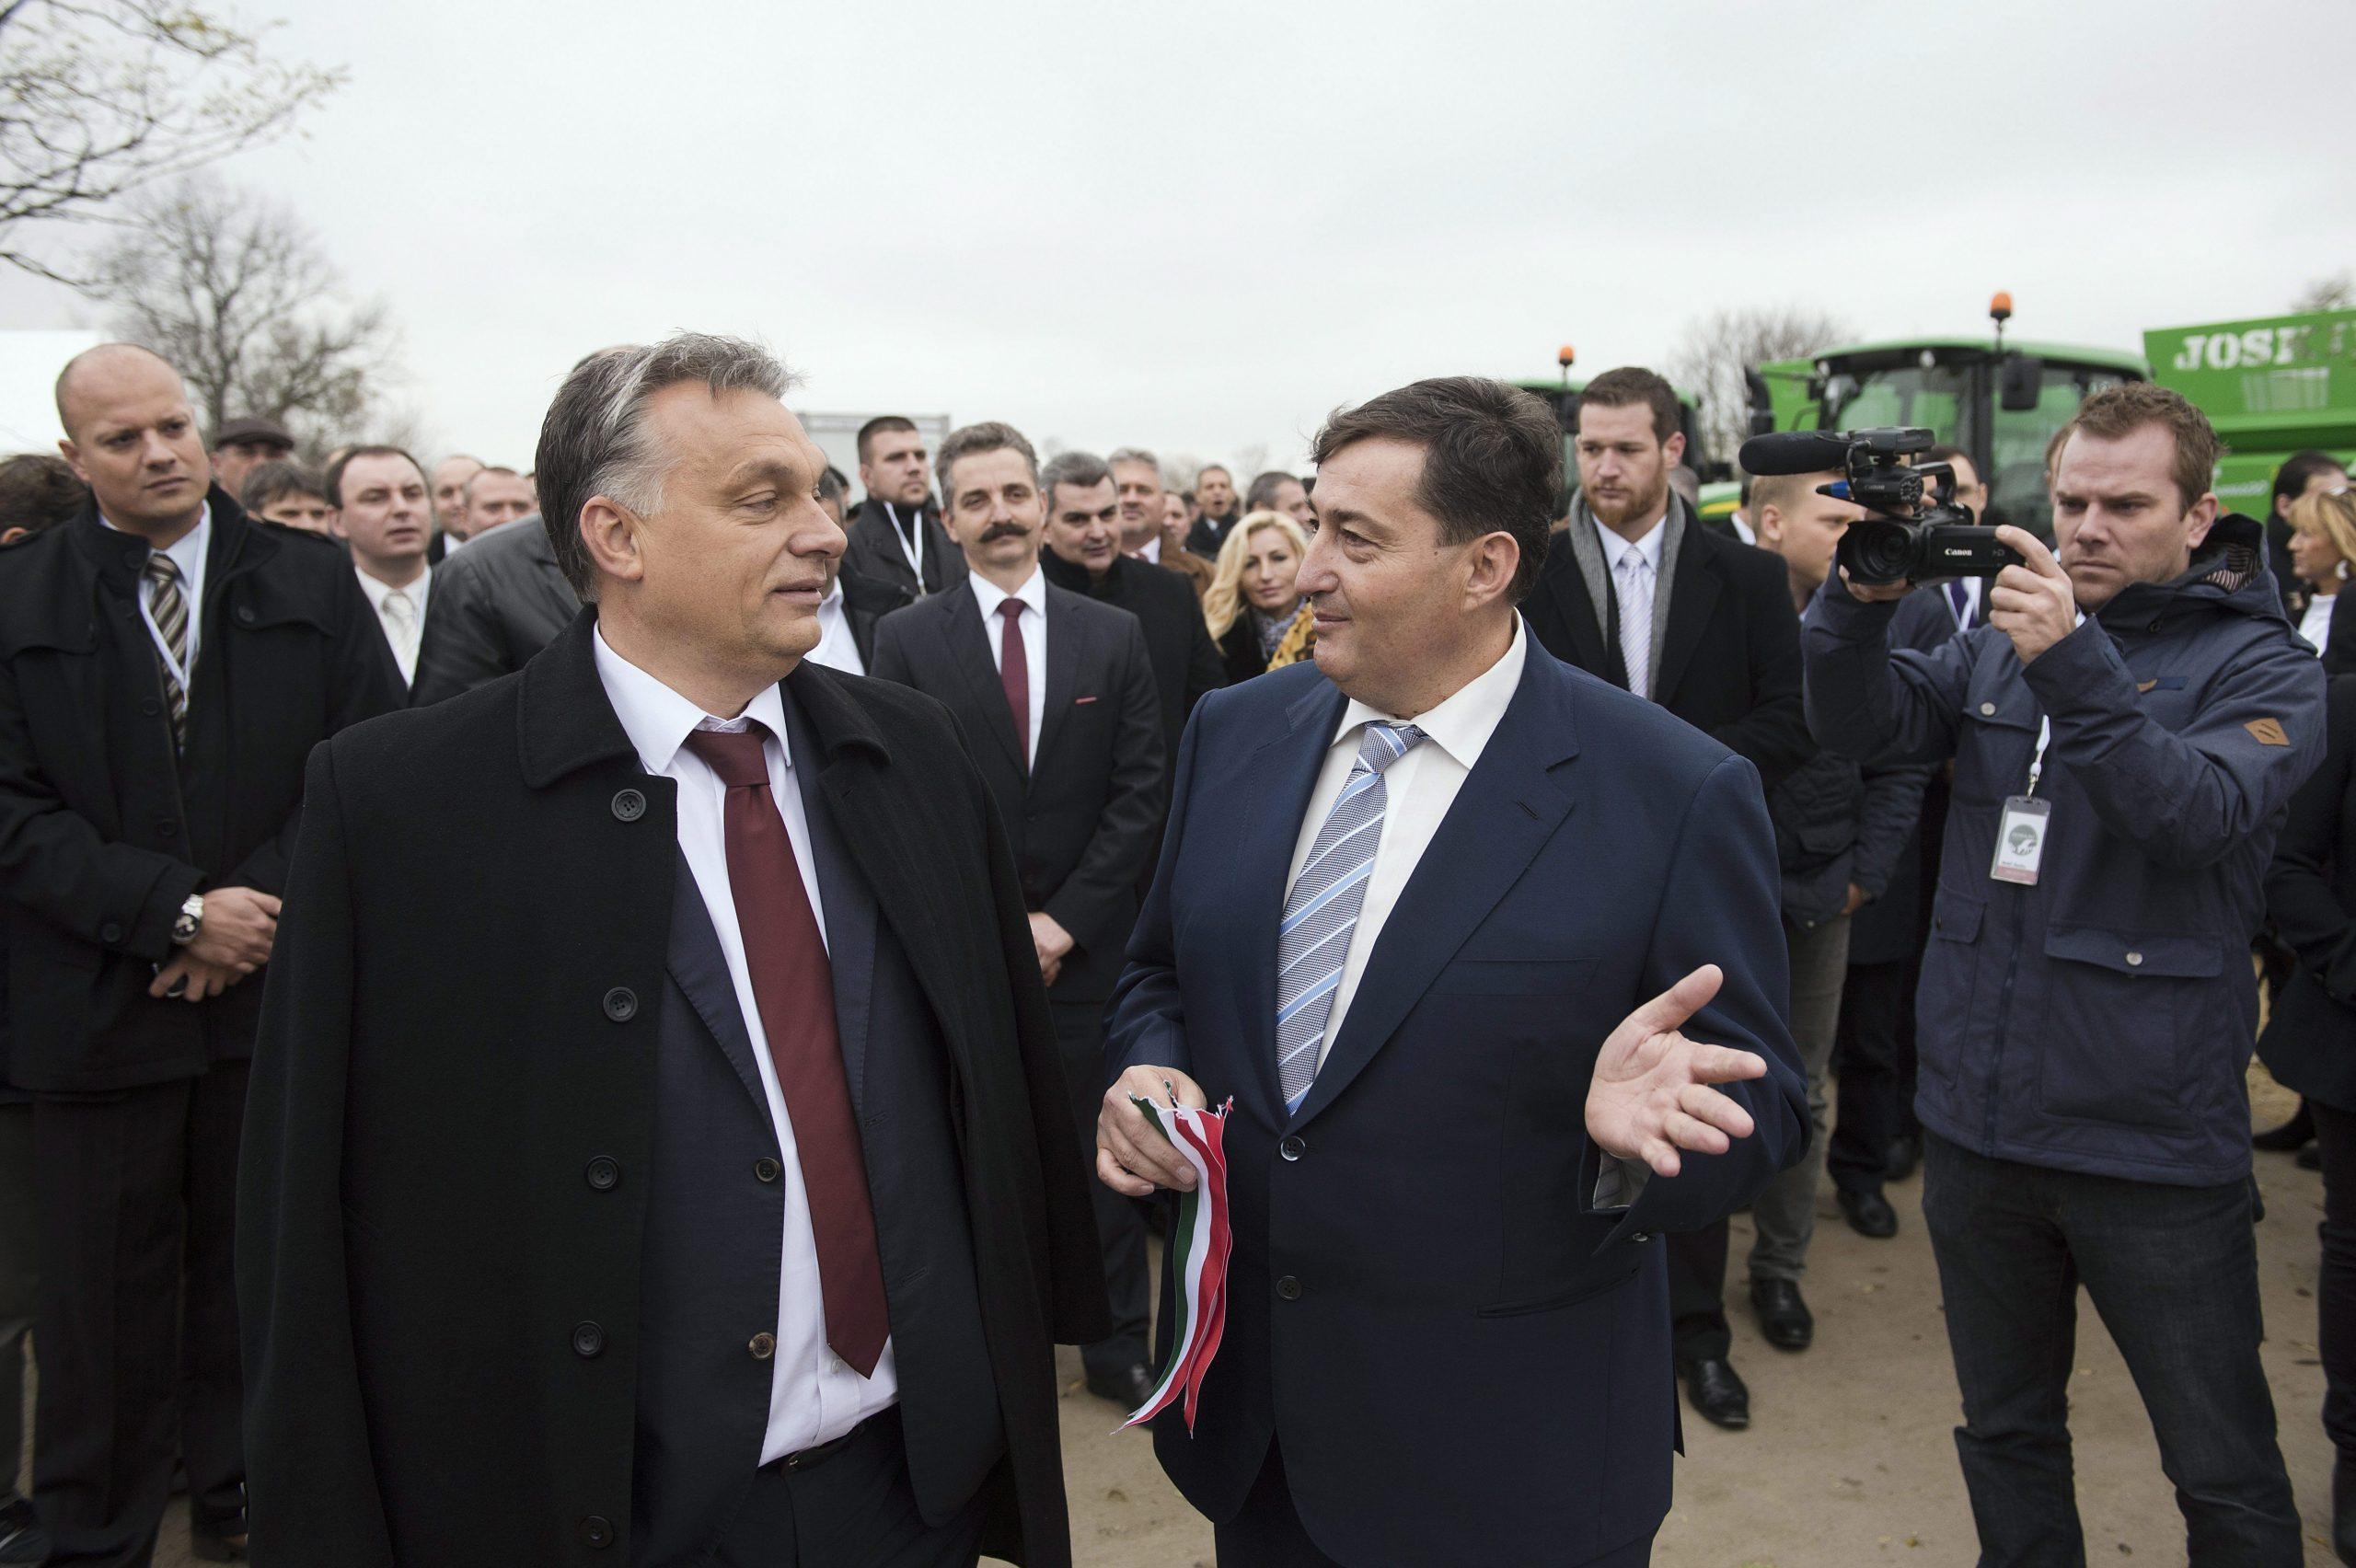 Lőrinc Mészáros Declared Richest Hungarian Generating Harsh Reaction from Opposition